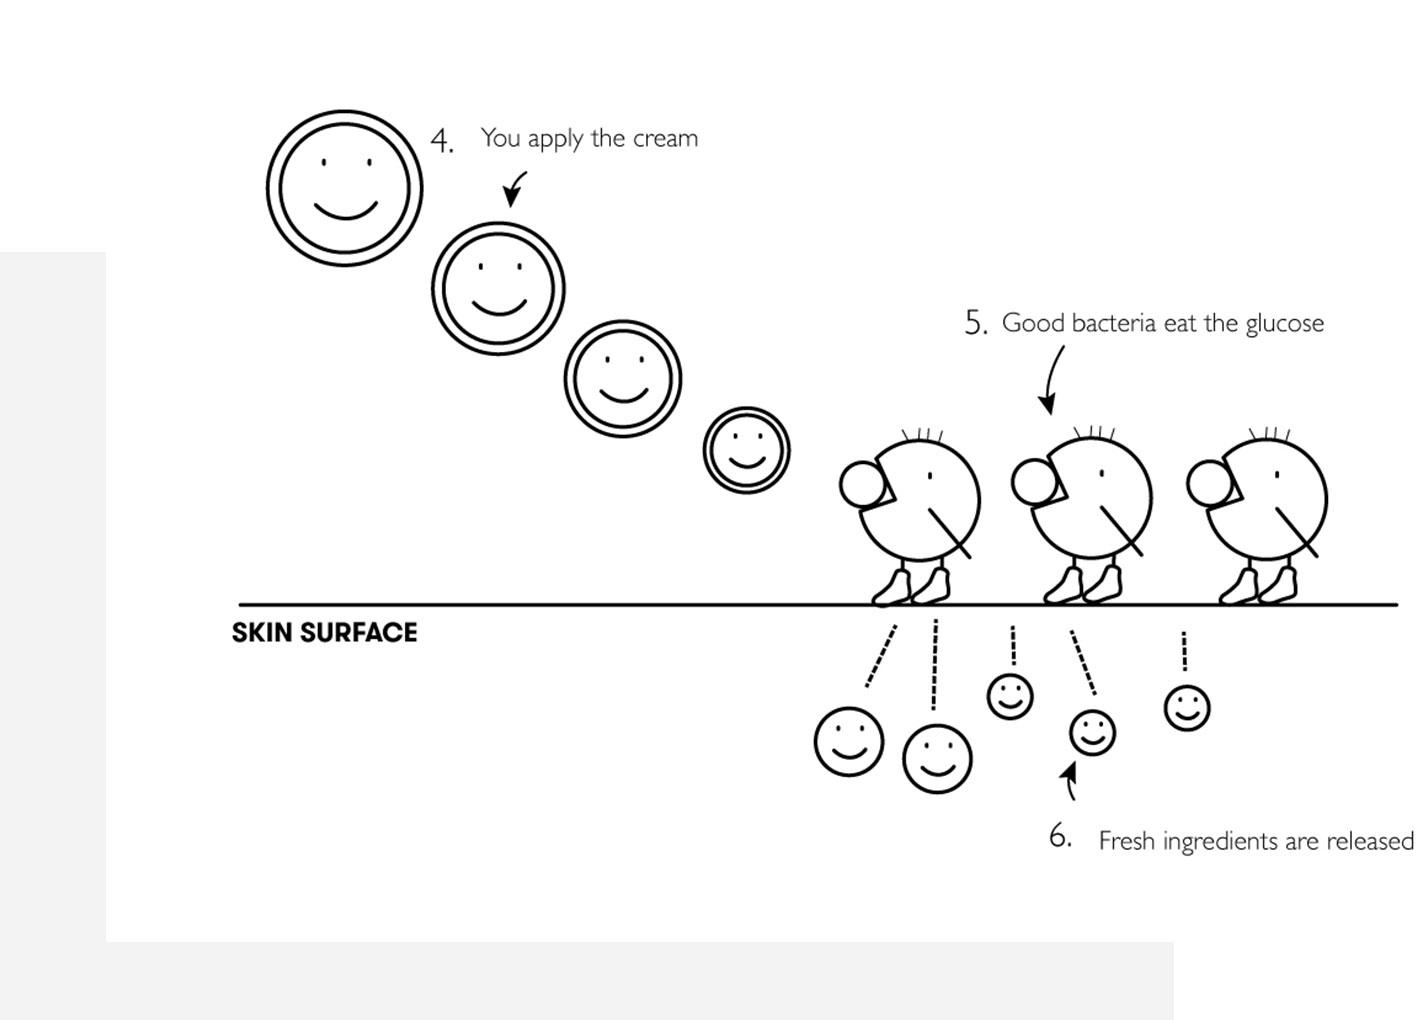 Magic skin word: microbiome.